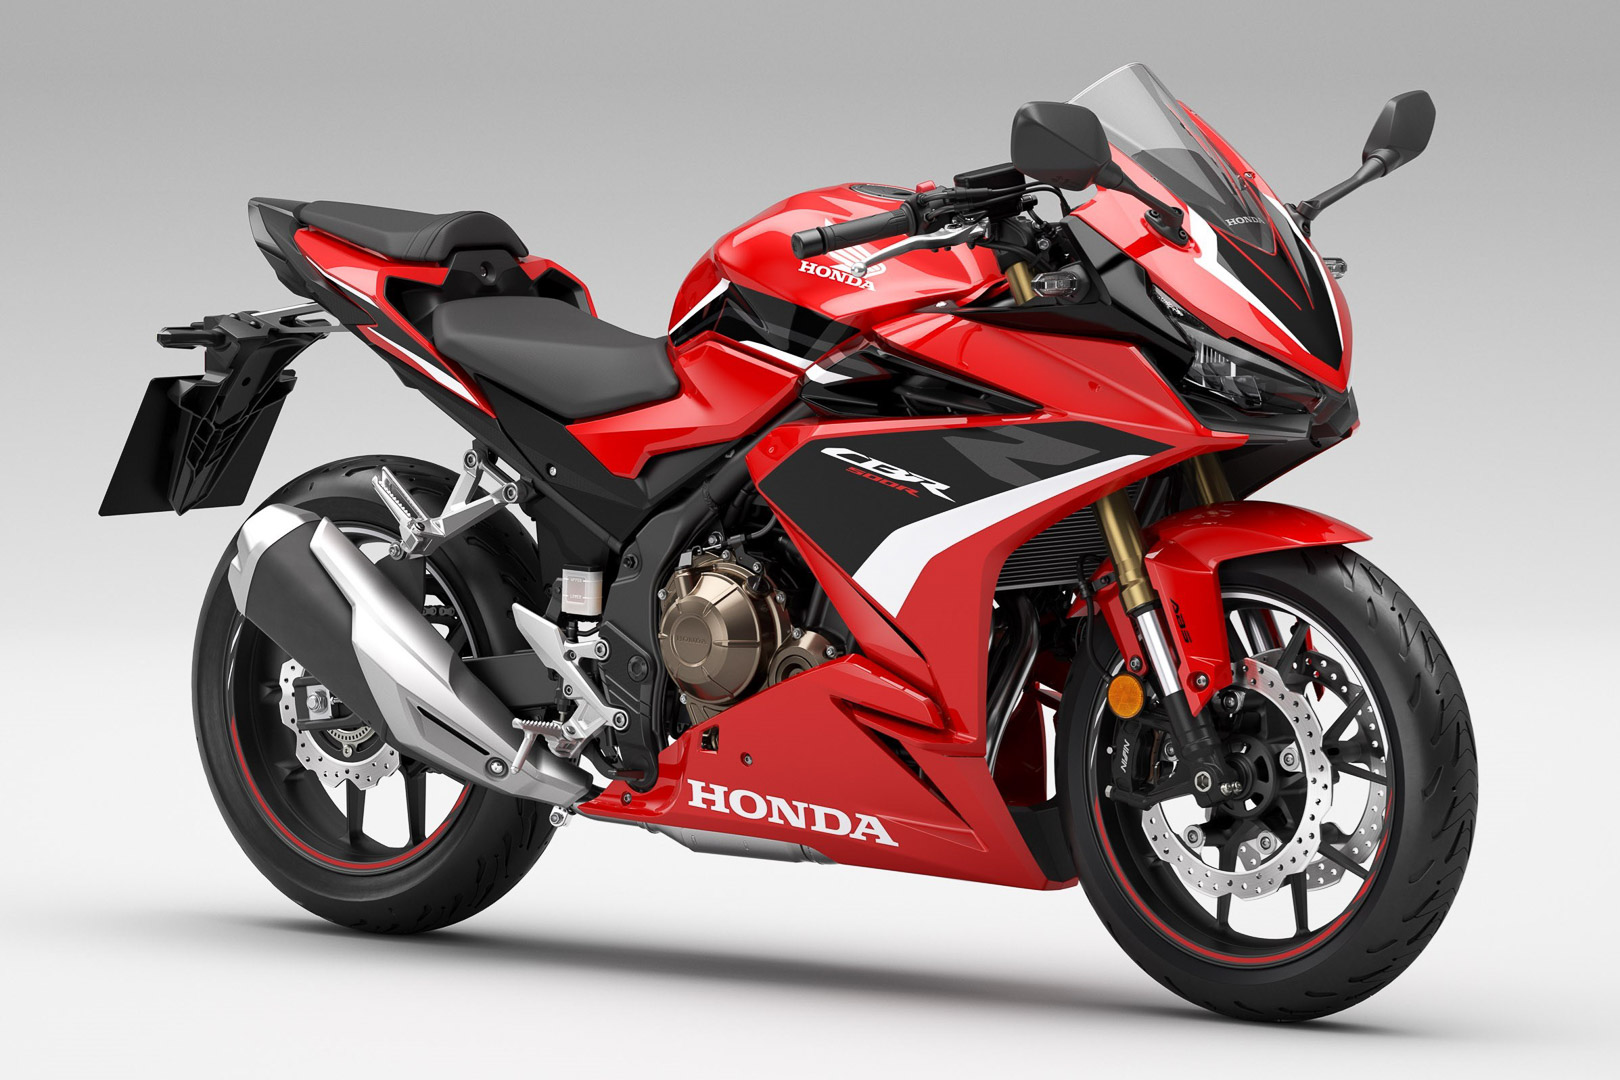 2022 Honda CBR500R,2021 honda cbr500r,2021 honda cbr500r review,2021 honda cbr500r top speed,2021 honda cbr500r abs,2021 honda cbr500r vs ninja 400,2021 honda cbr500r white